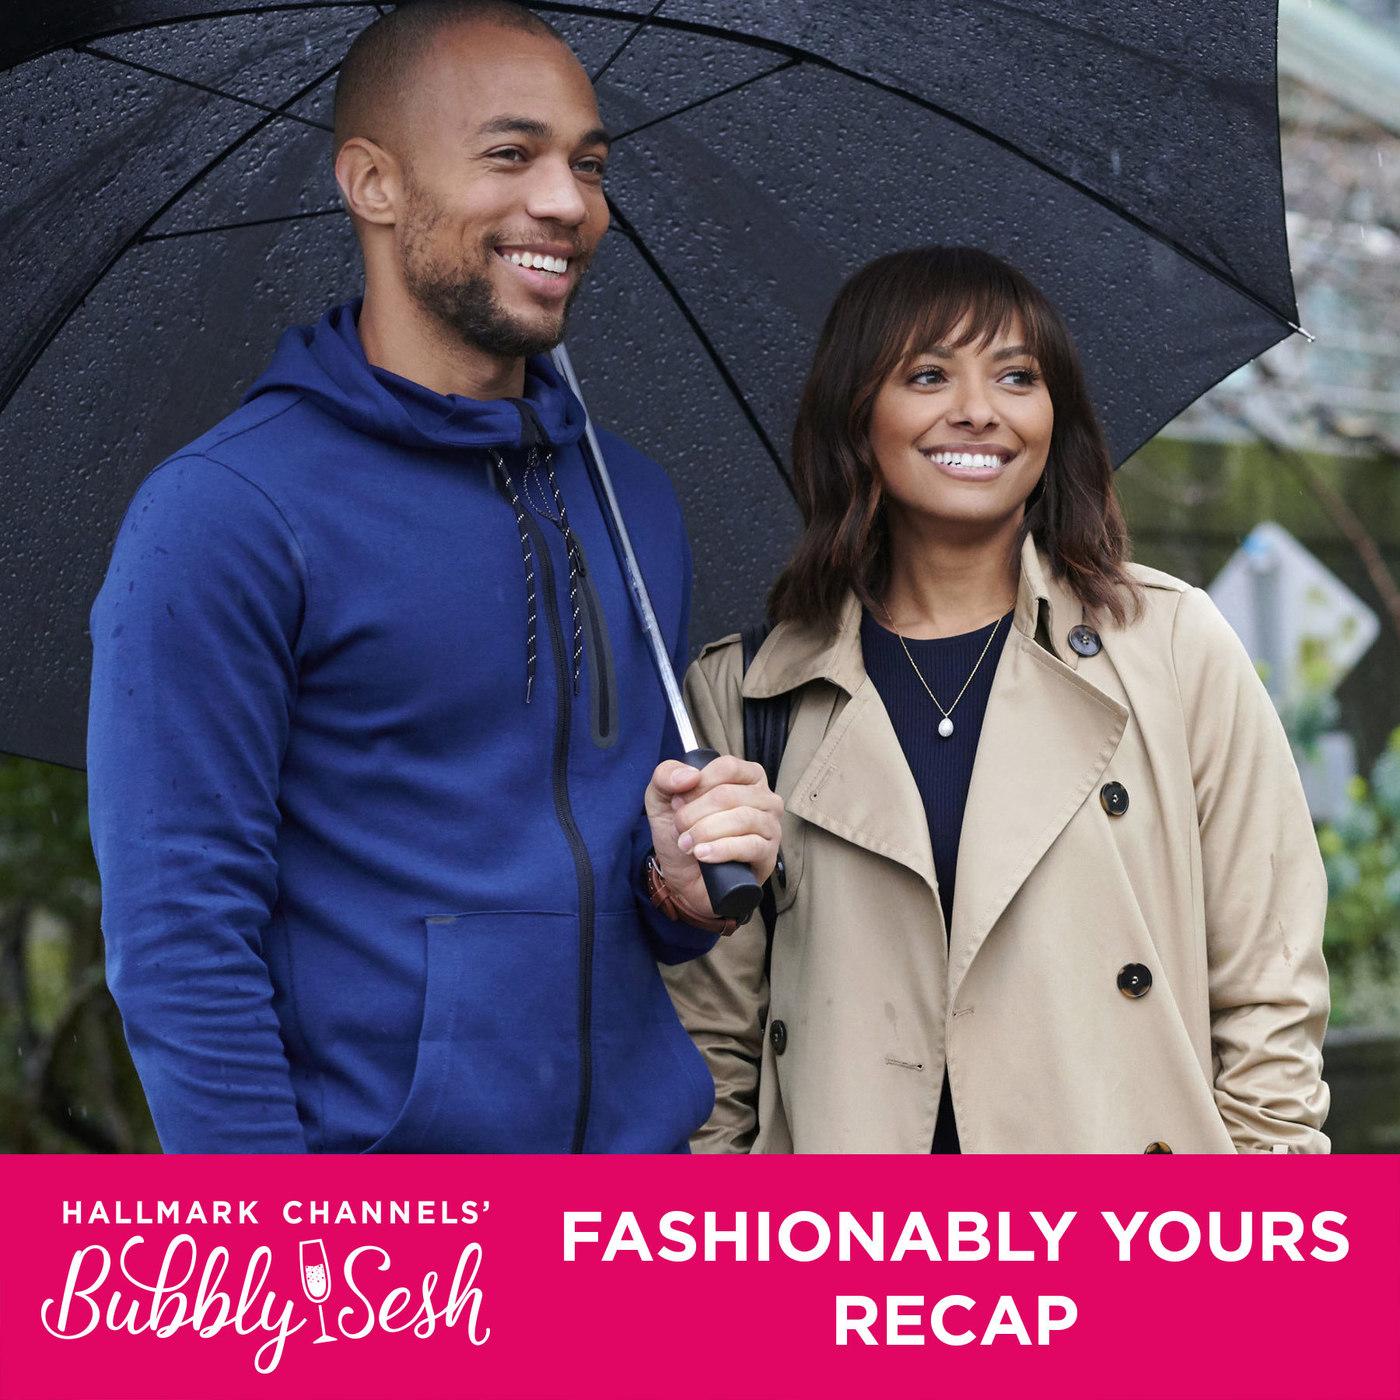 Fashionably Yours Recap